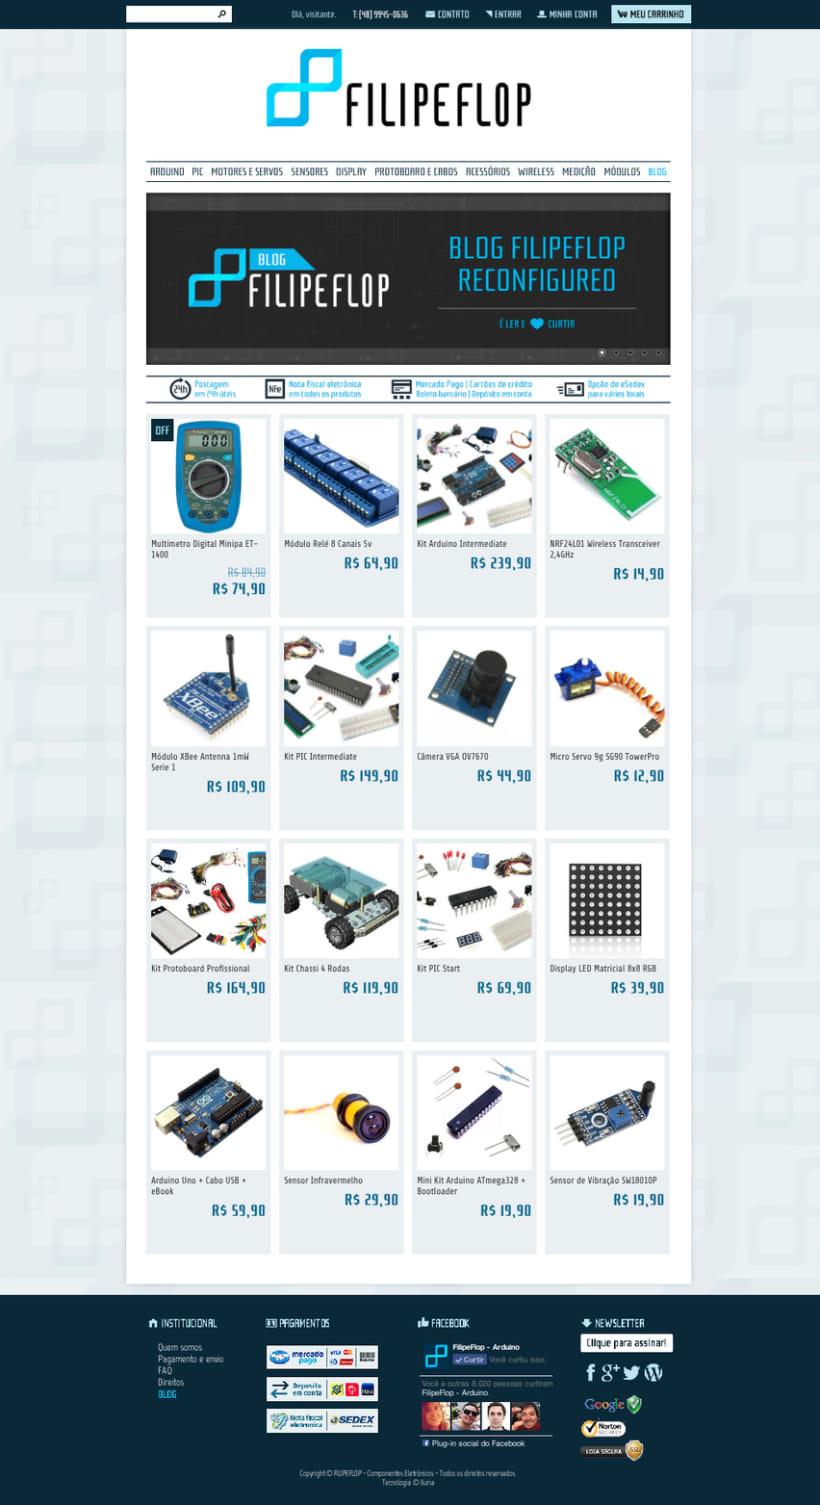 DIGITAL / FILIPEFLOP - Blog, newlsletter, fanpage, web, mail, etc 5